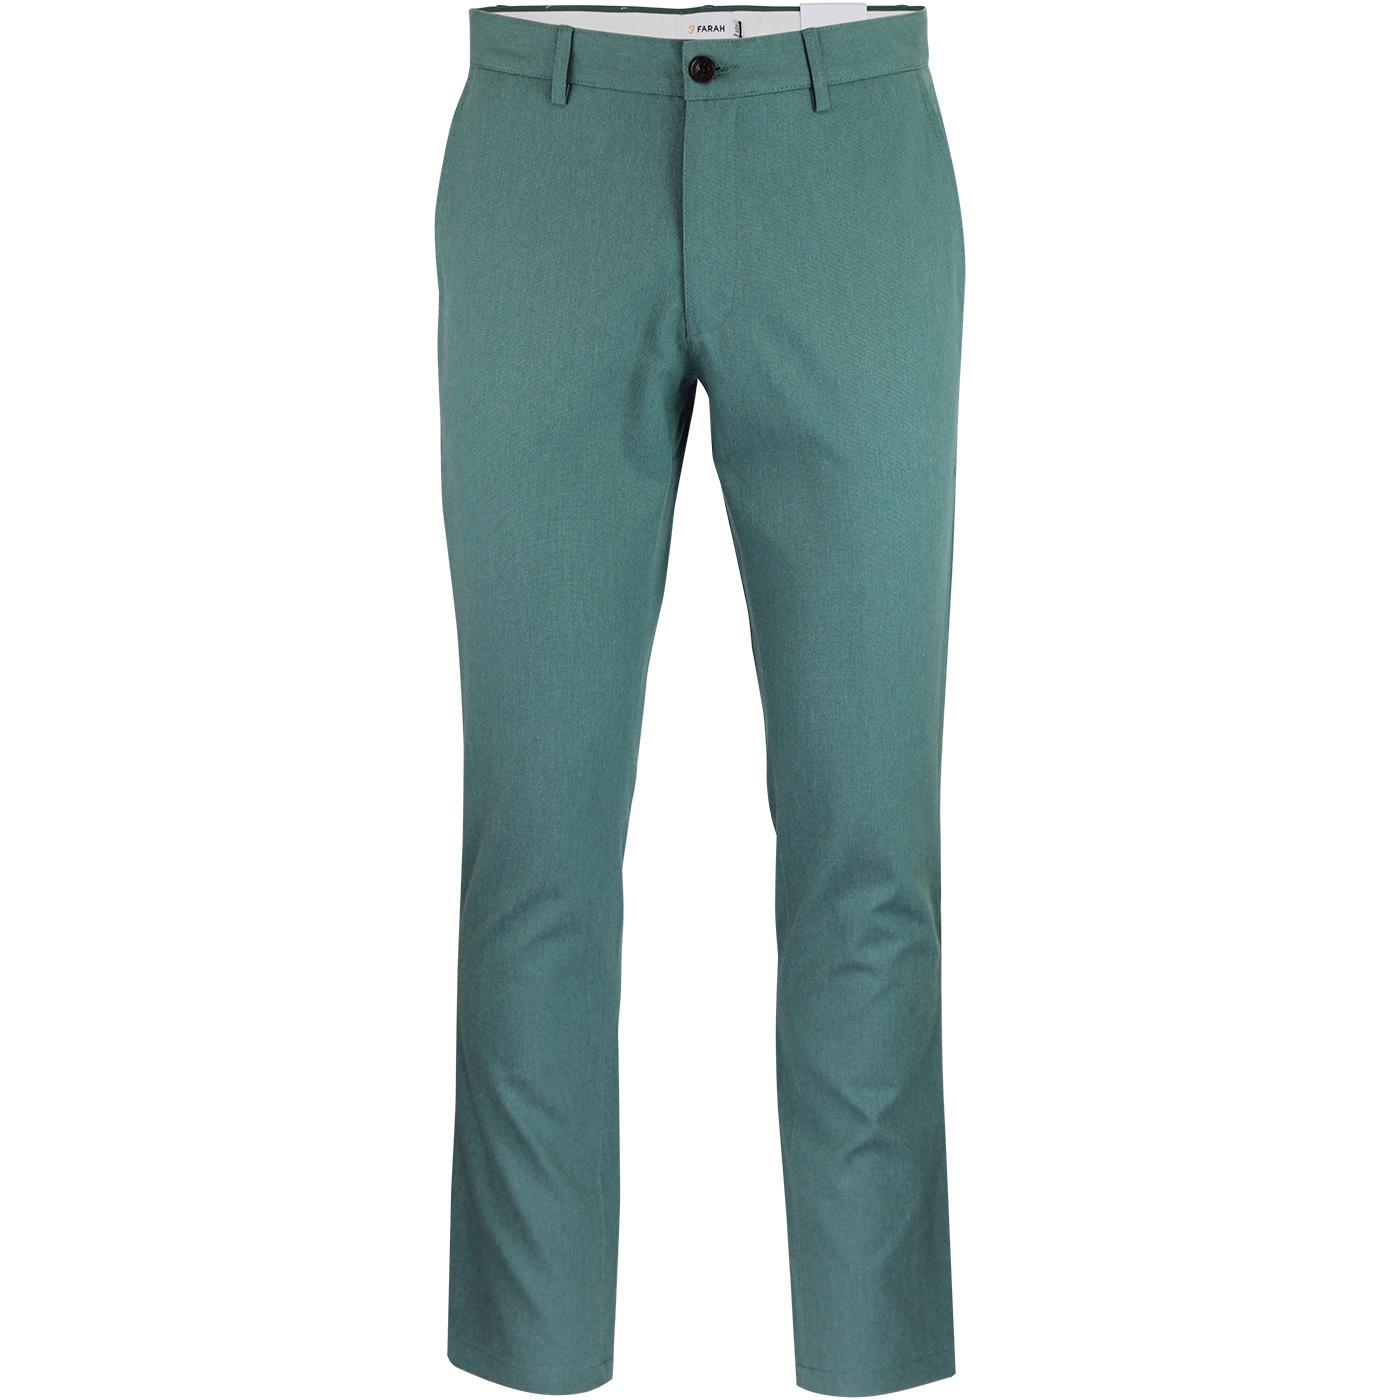 Elm FARAH Retro Mod Slim Hopsack Trousers (Green)